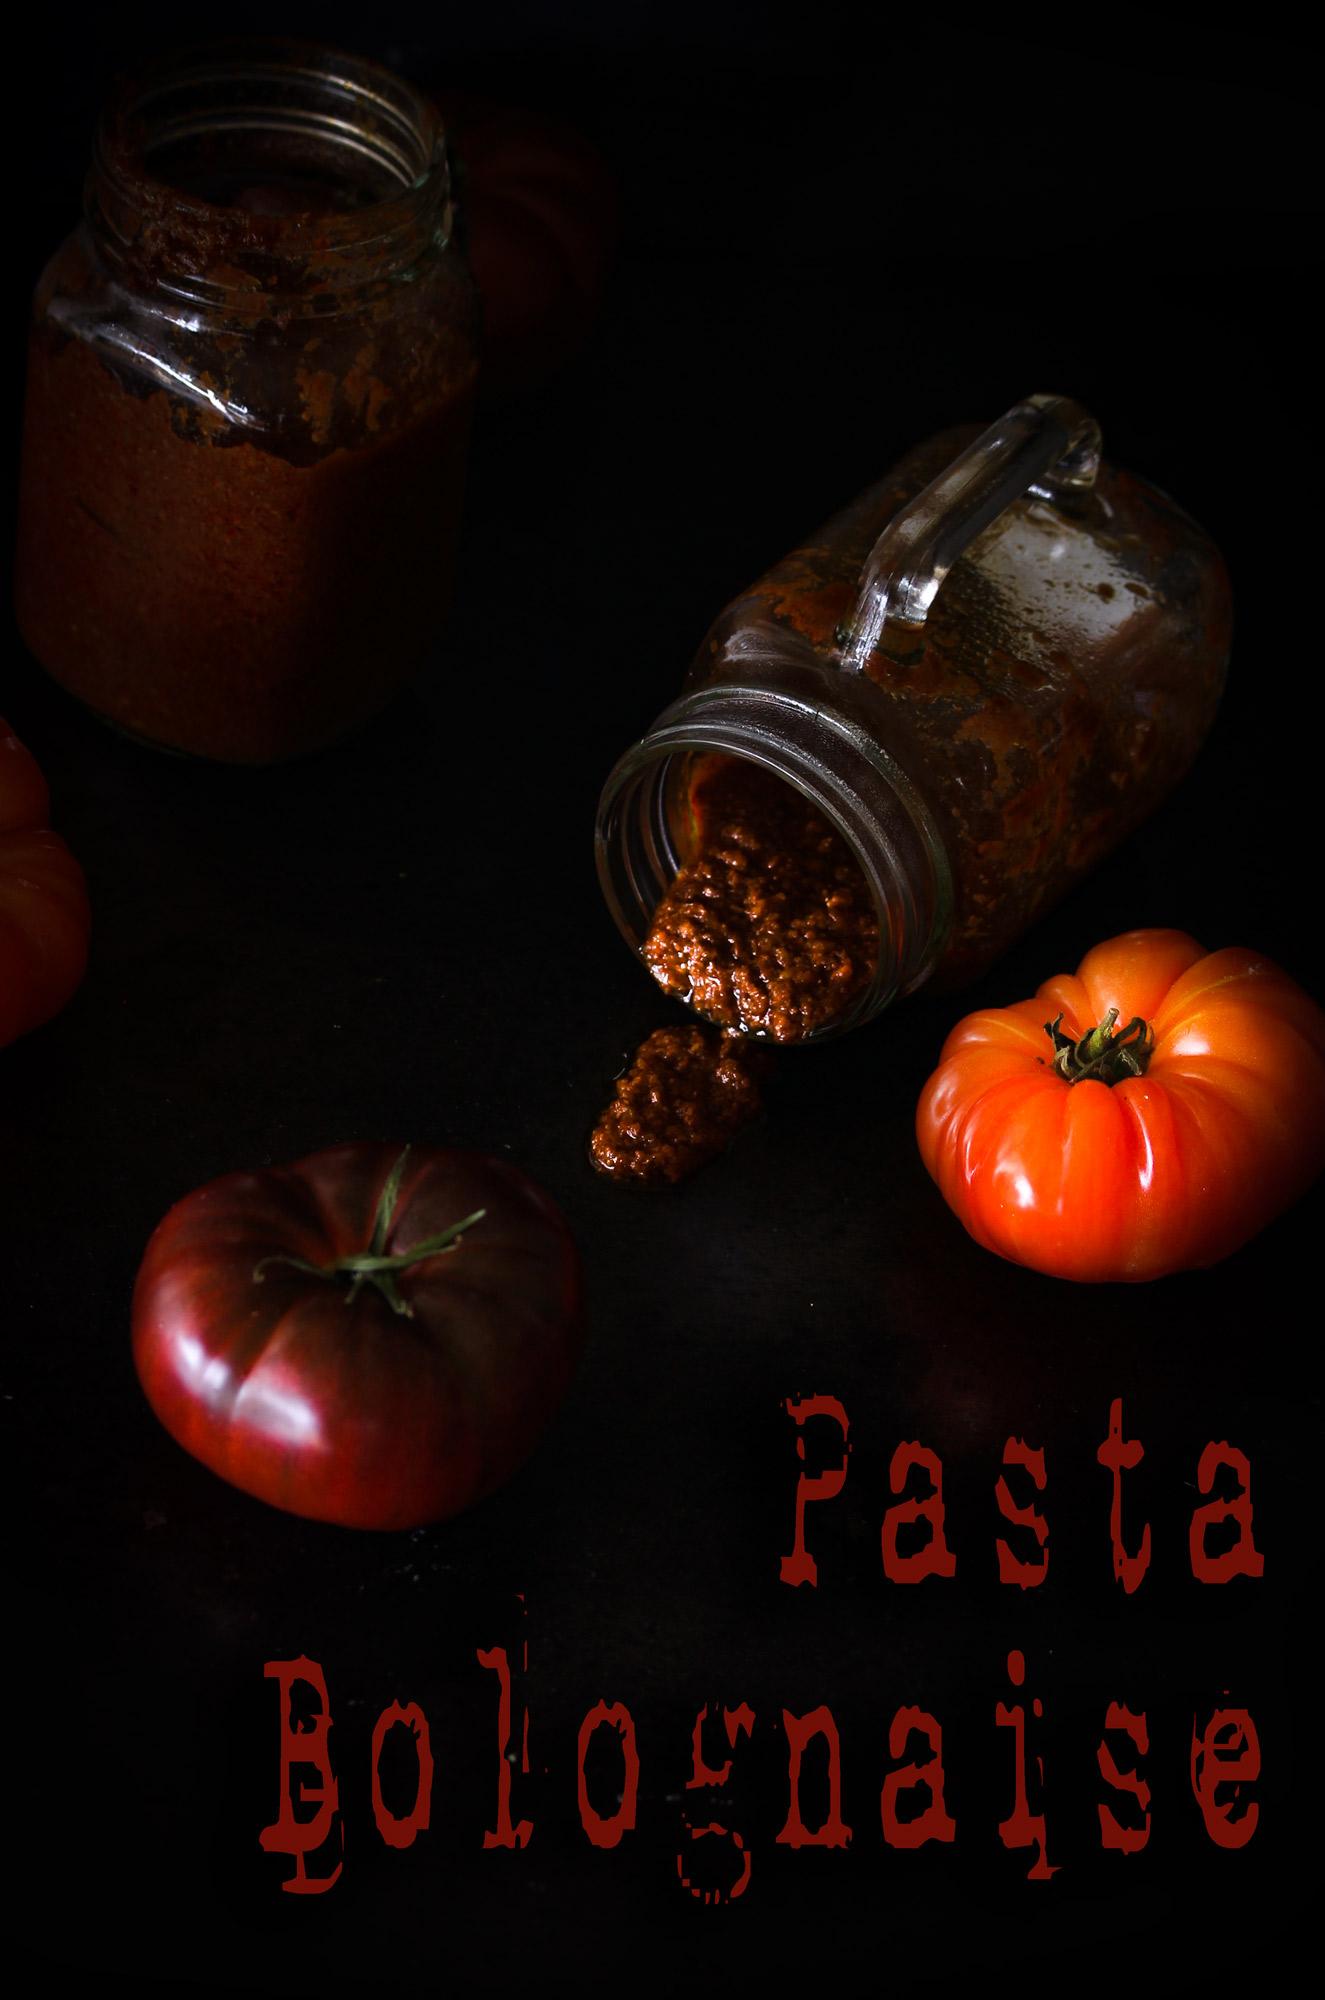 tomato, tomato sauce, cumin , kosher, jewish , kosherfood, meat beef, ground beef,tomate , sauce , shabath , chabath; shabbat, spice ; cilantro, recipe, blog, food, homemade; healthy bolonaise, sauce , pate , pasta, sauce bolonaise, pate a la bolonaise, bolo , kosher, kosher food, jewish